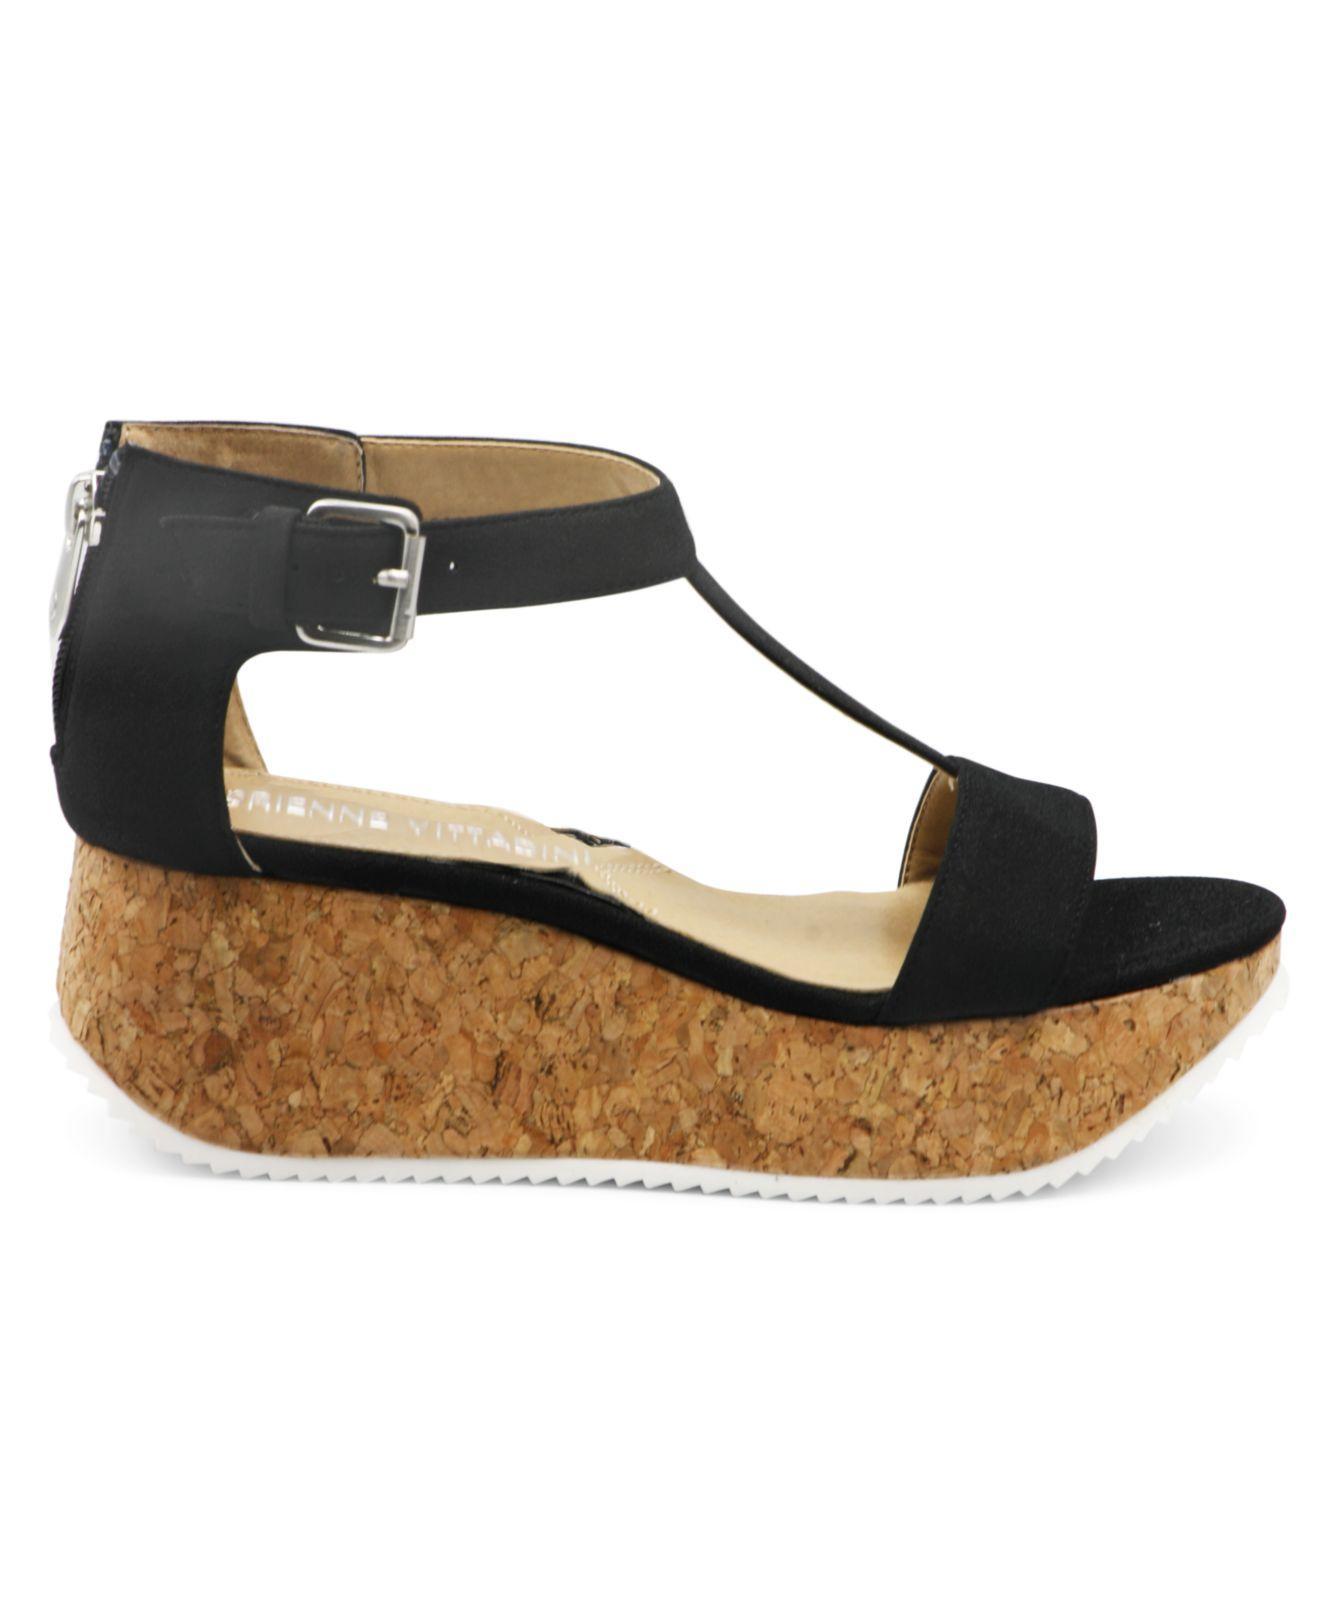 039f6f1a4975 Lyst - Adrienne Vittadini Chaps Platform Wedge Sandal in Black